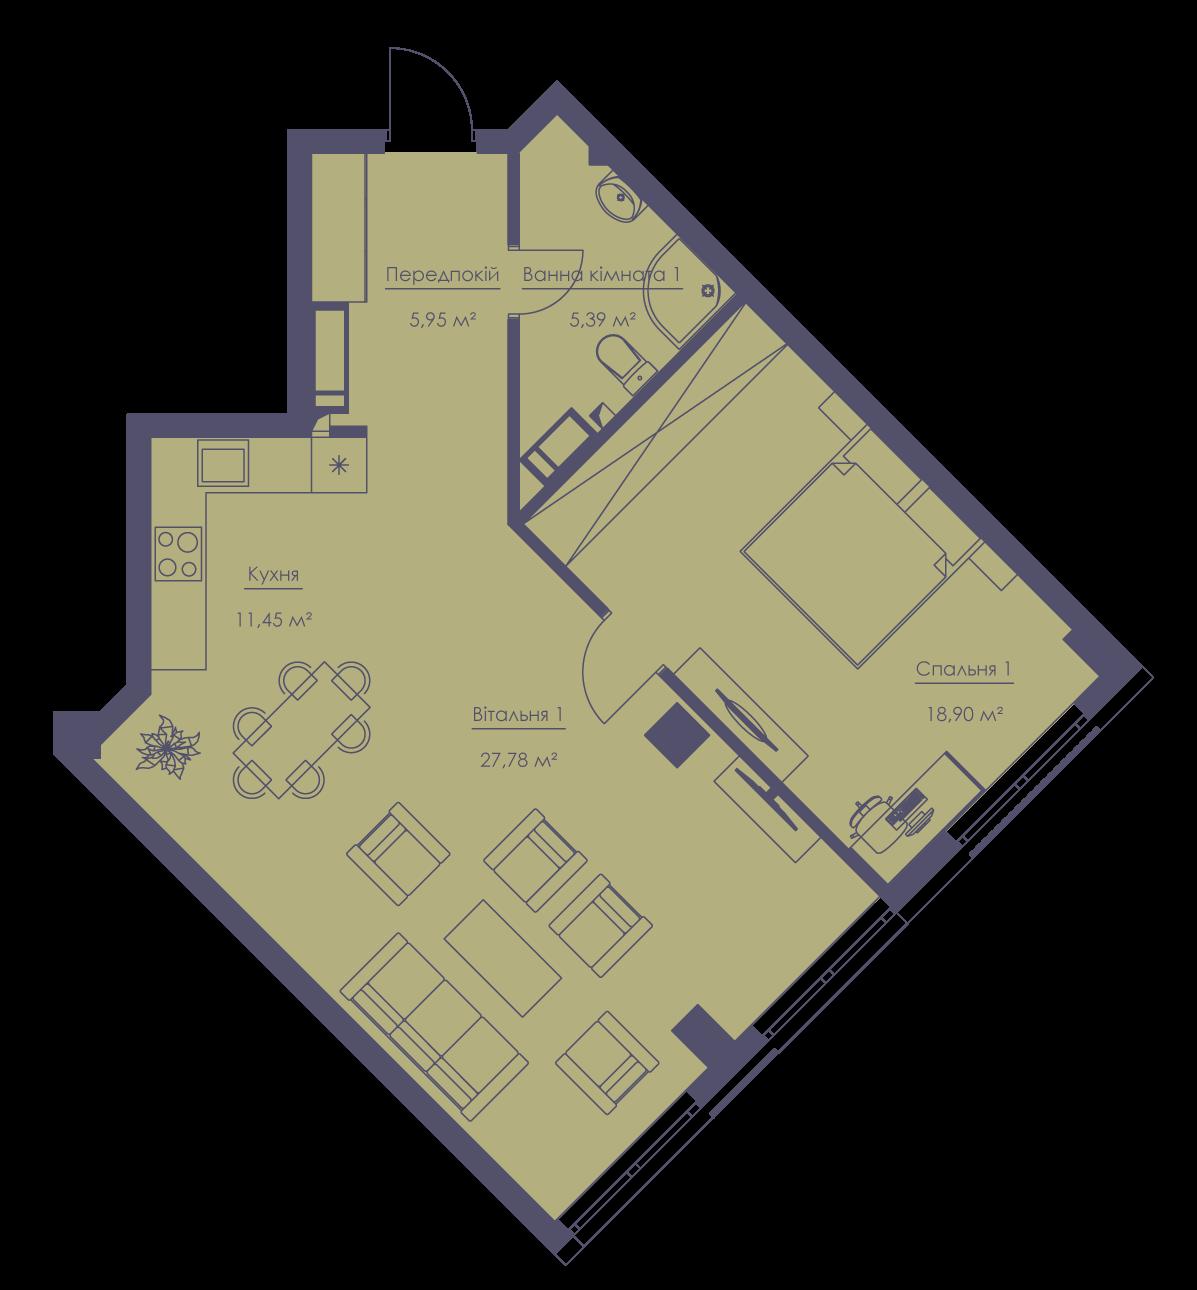 Apartment layout KV_113_3.2a_1_1_1-1